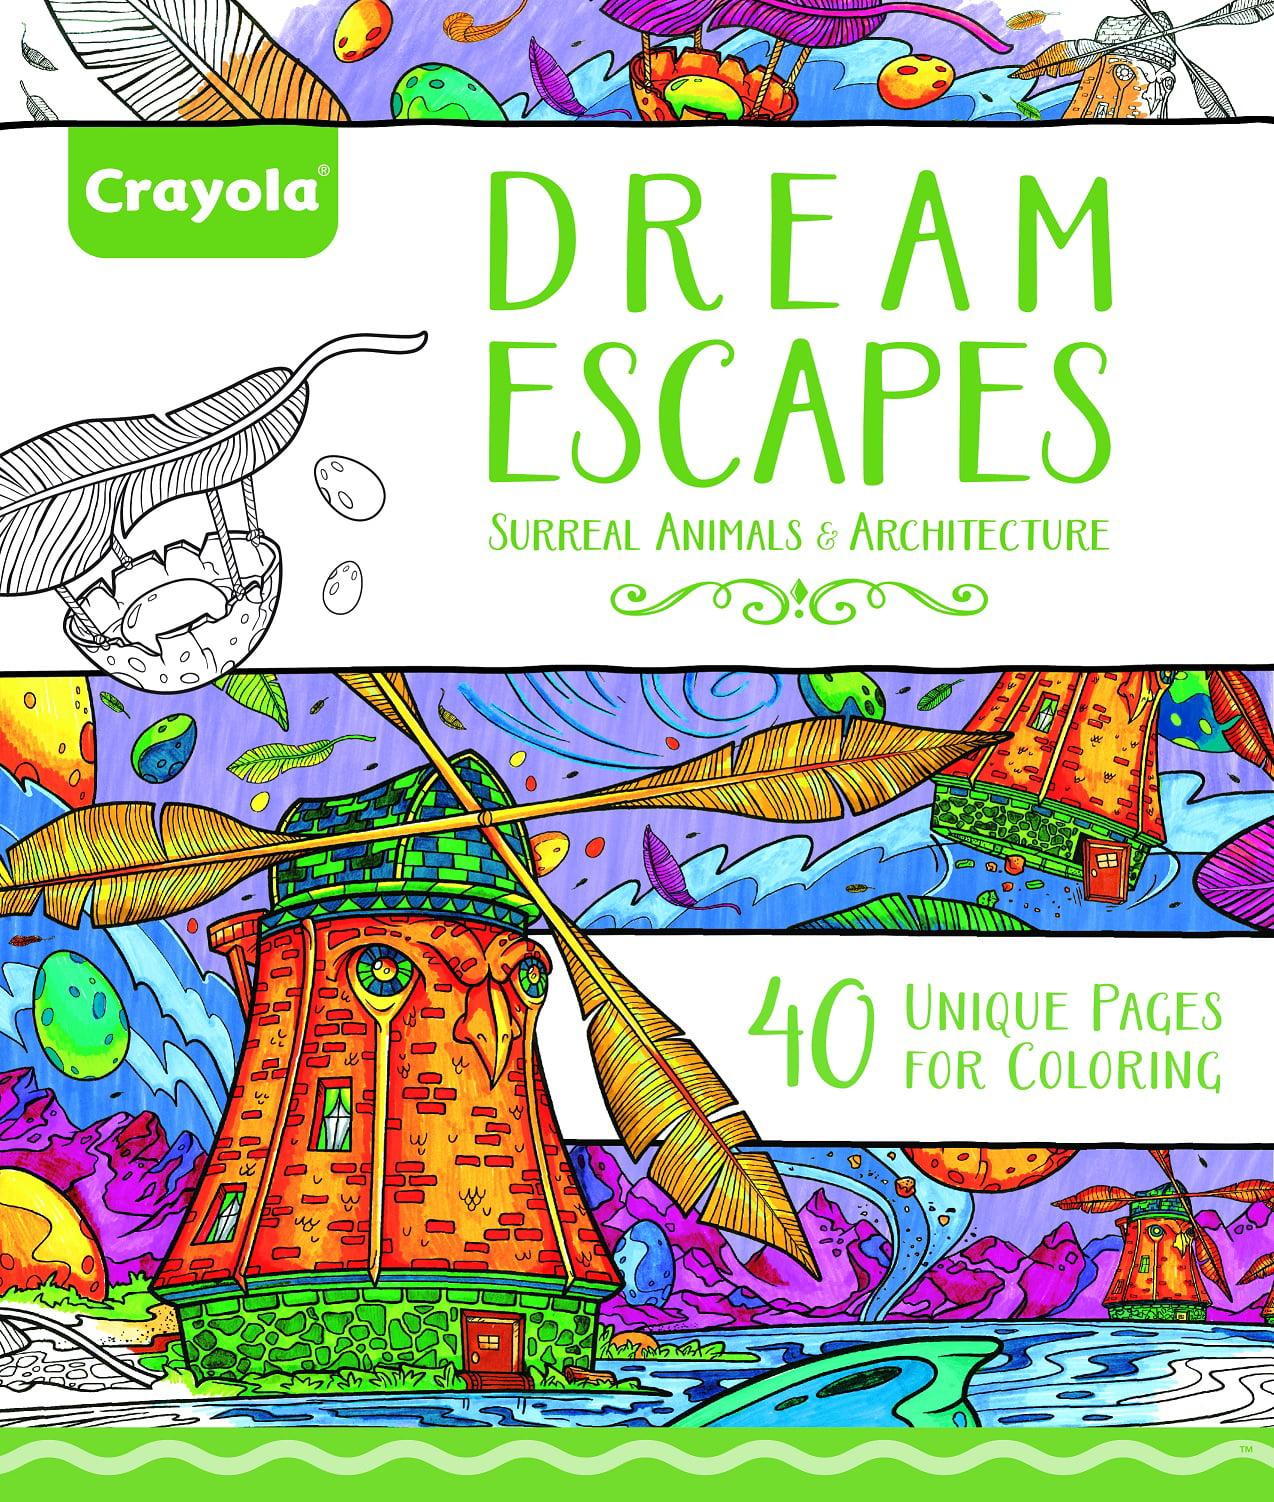 Crayola Dream Escapes Adult Coloring Book, 40 Pages by Crayola